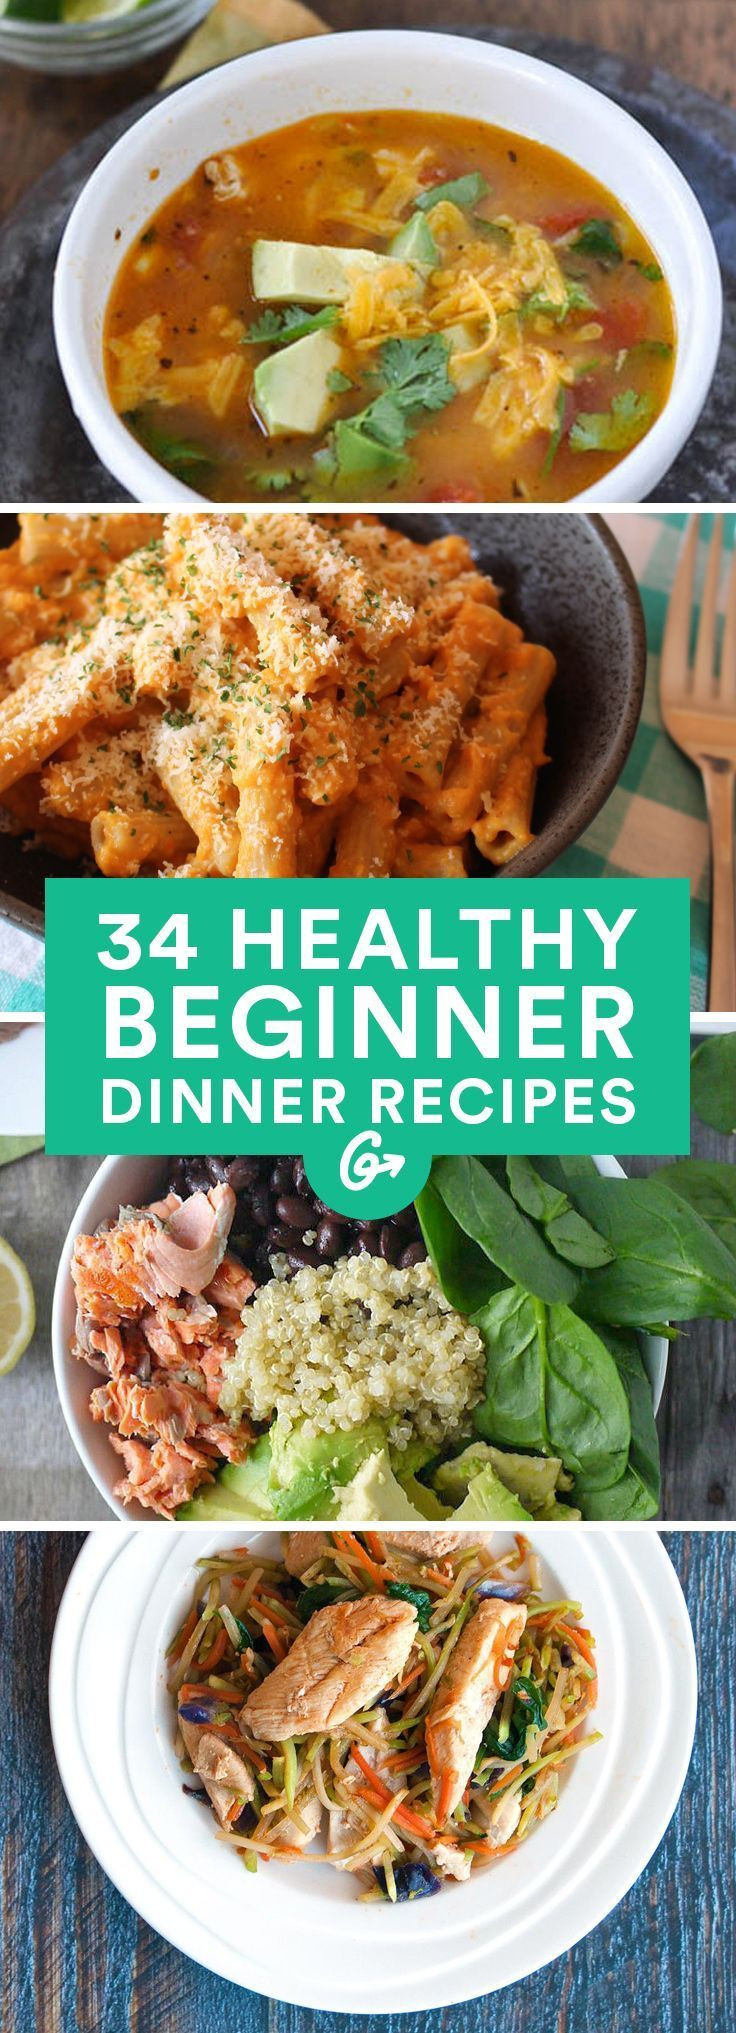 Easy Healthy Dinner Recipes  100 Healthy Dinner Recipes on Pinterest